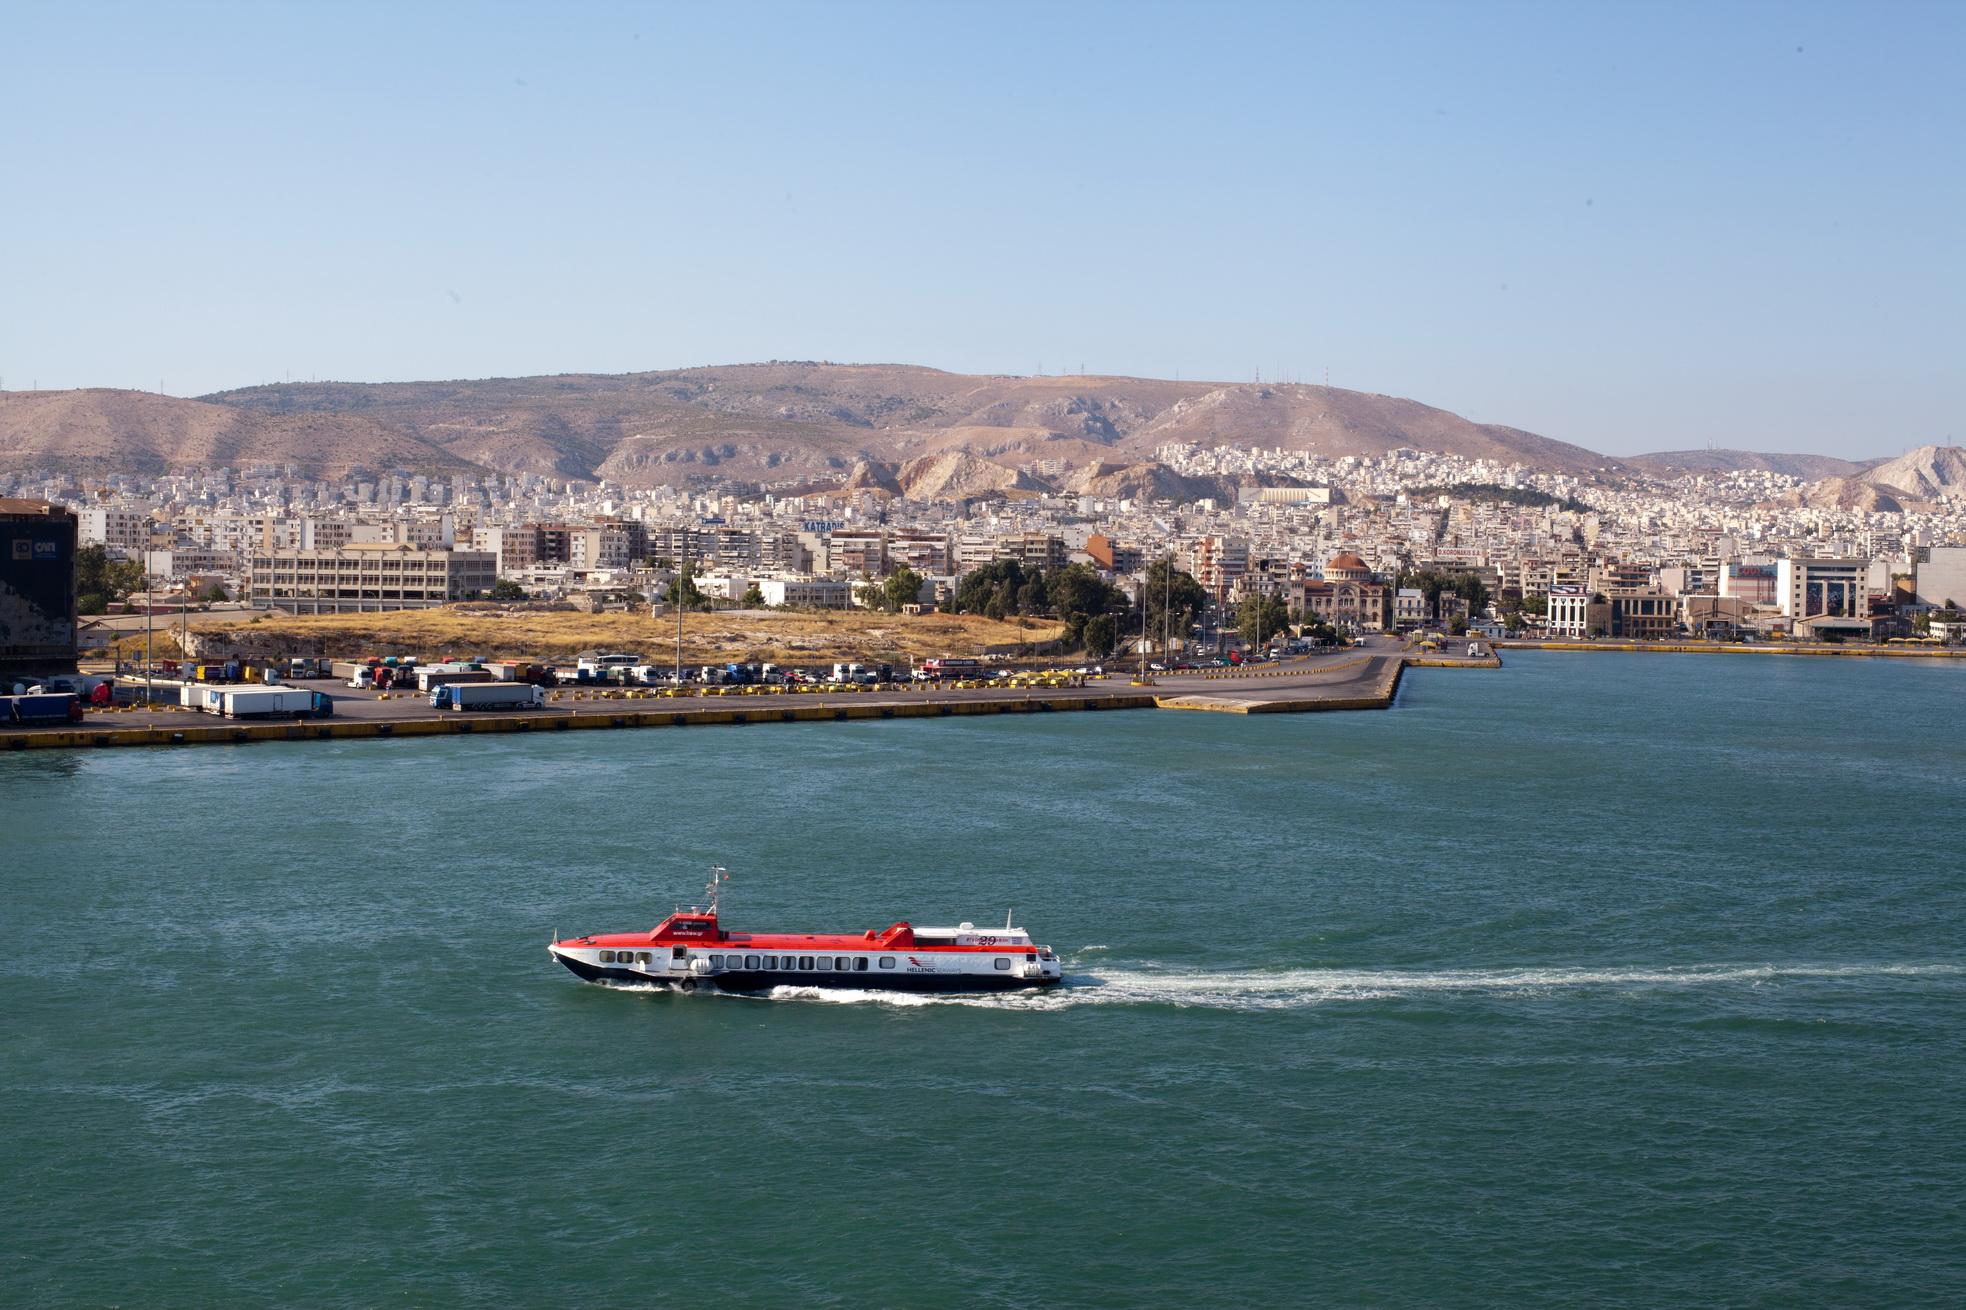 MS Flying Dolphin 29 IMO 8875700 Hellenic Seaways Piraeus Port of Athens Greece 06